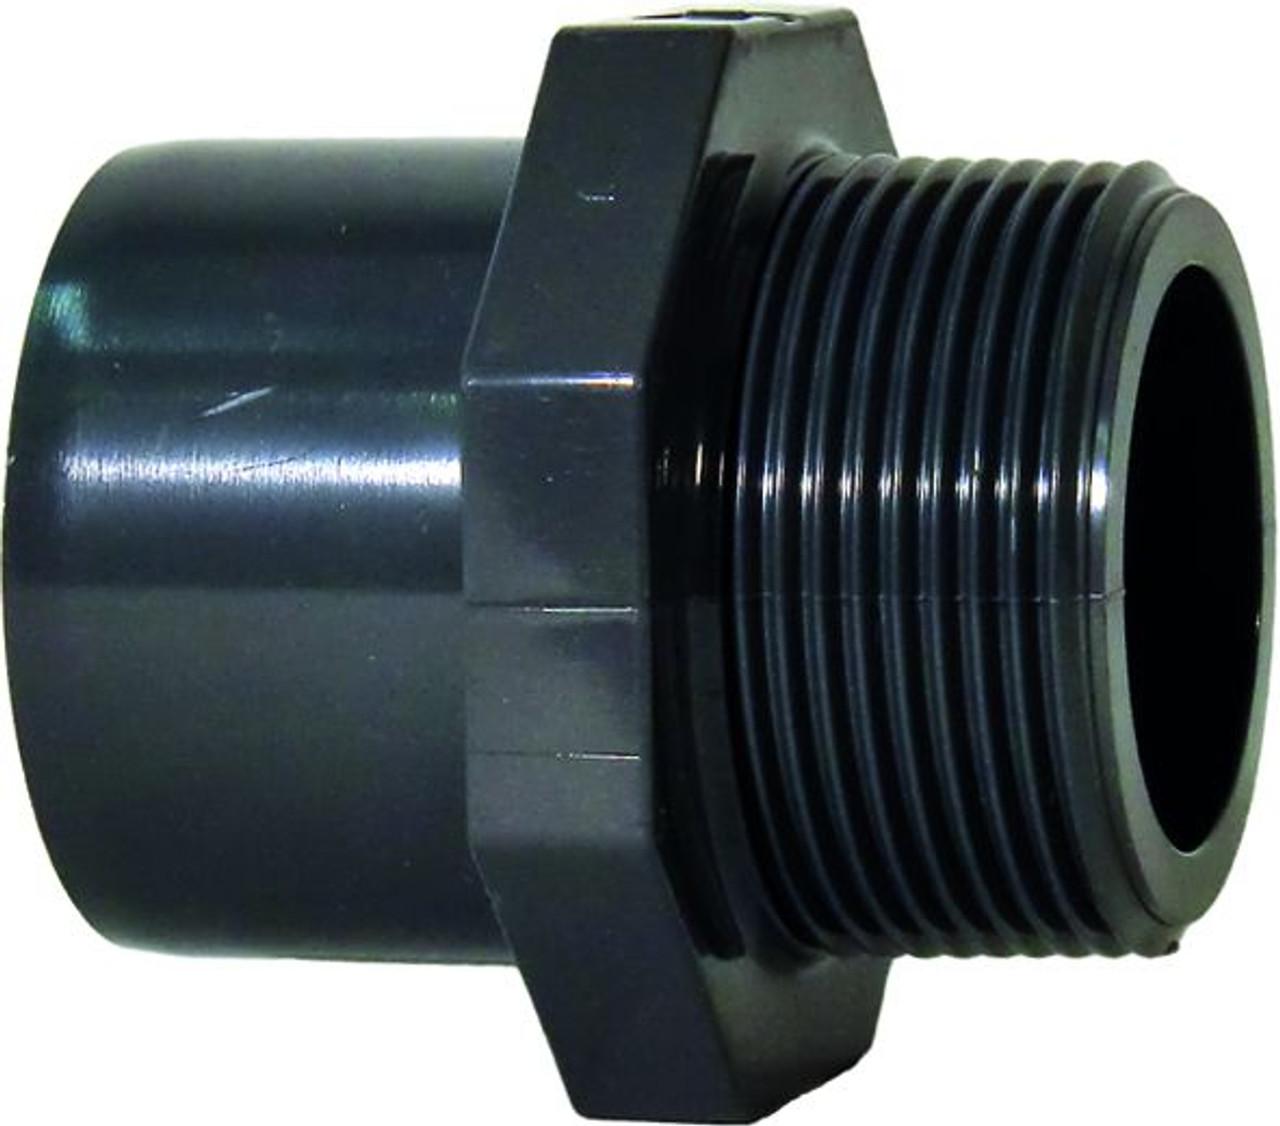 "+GF+   Male Thread Adapter PVC-U 32mm x R11/4"" (721910559)"